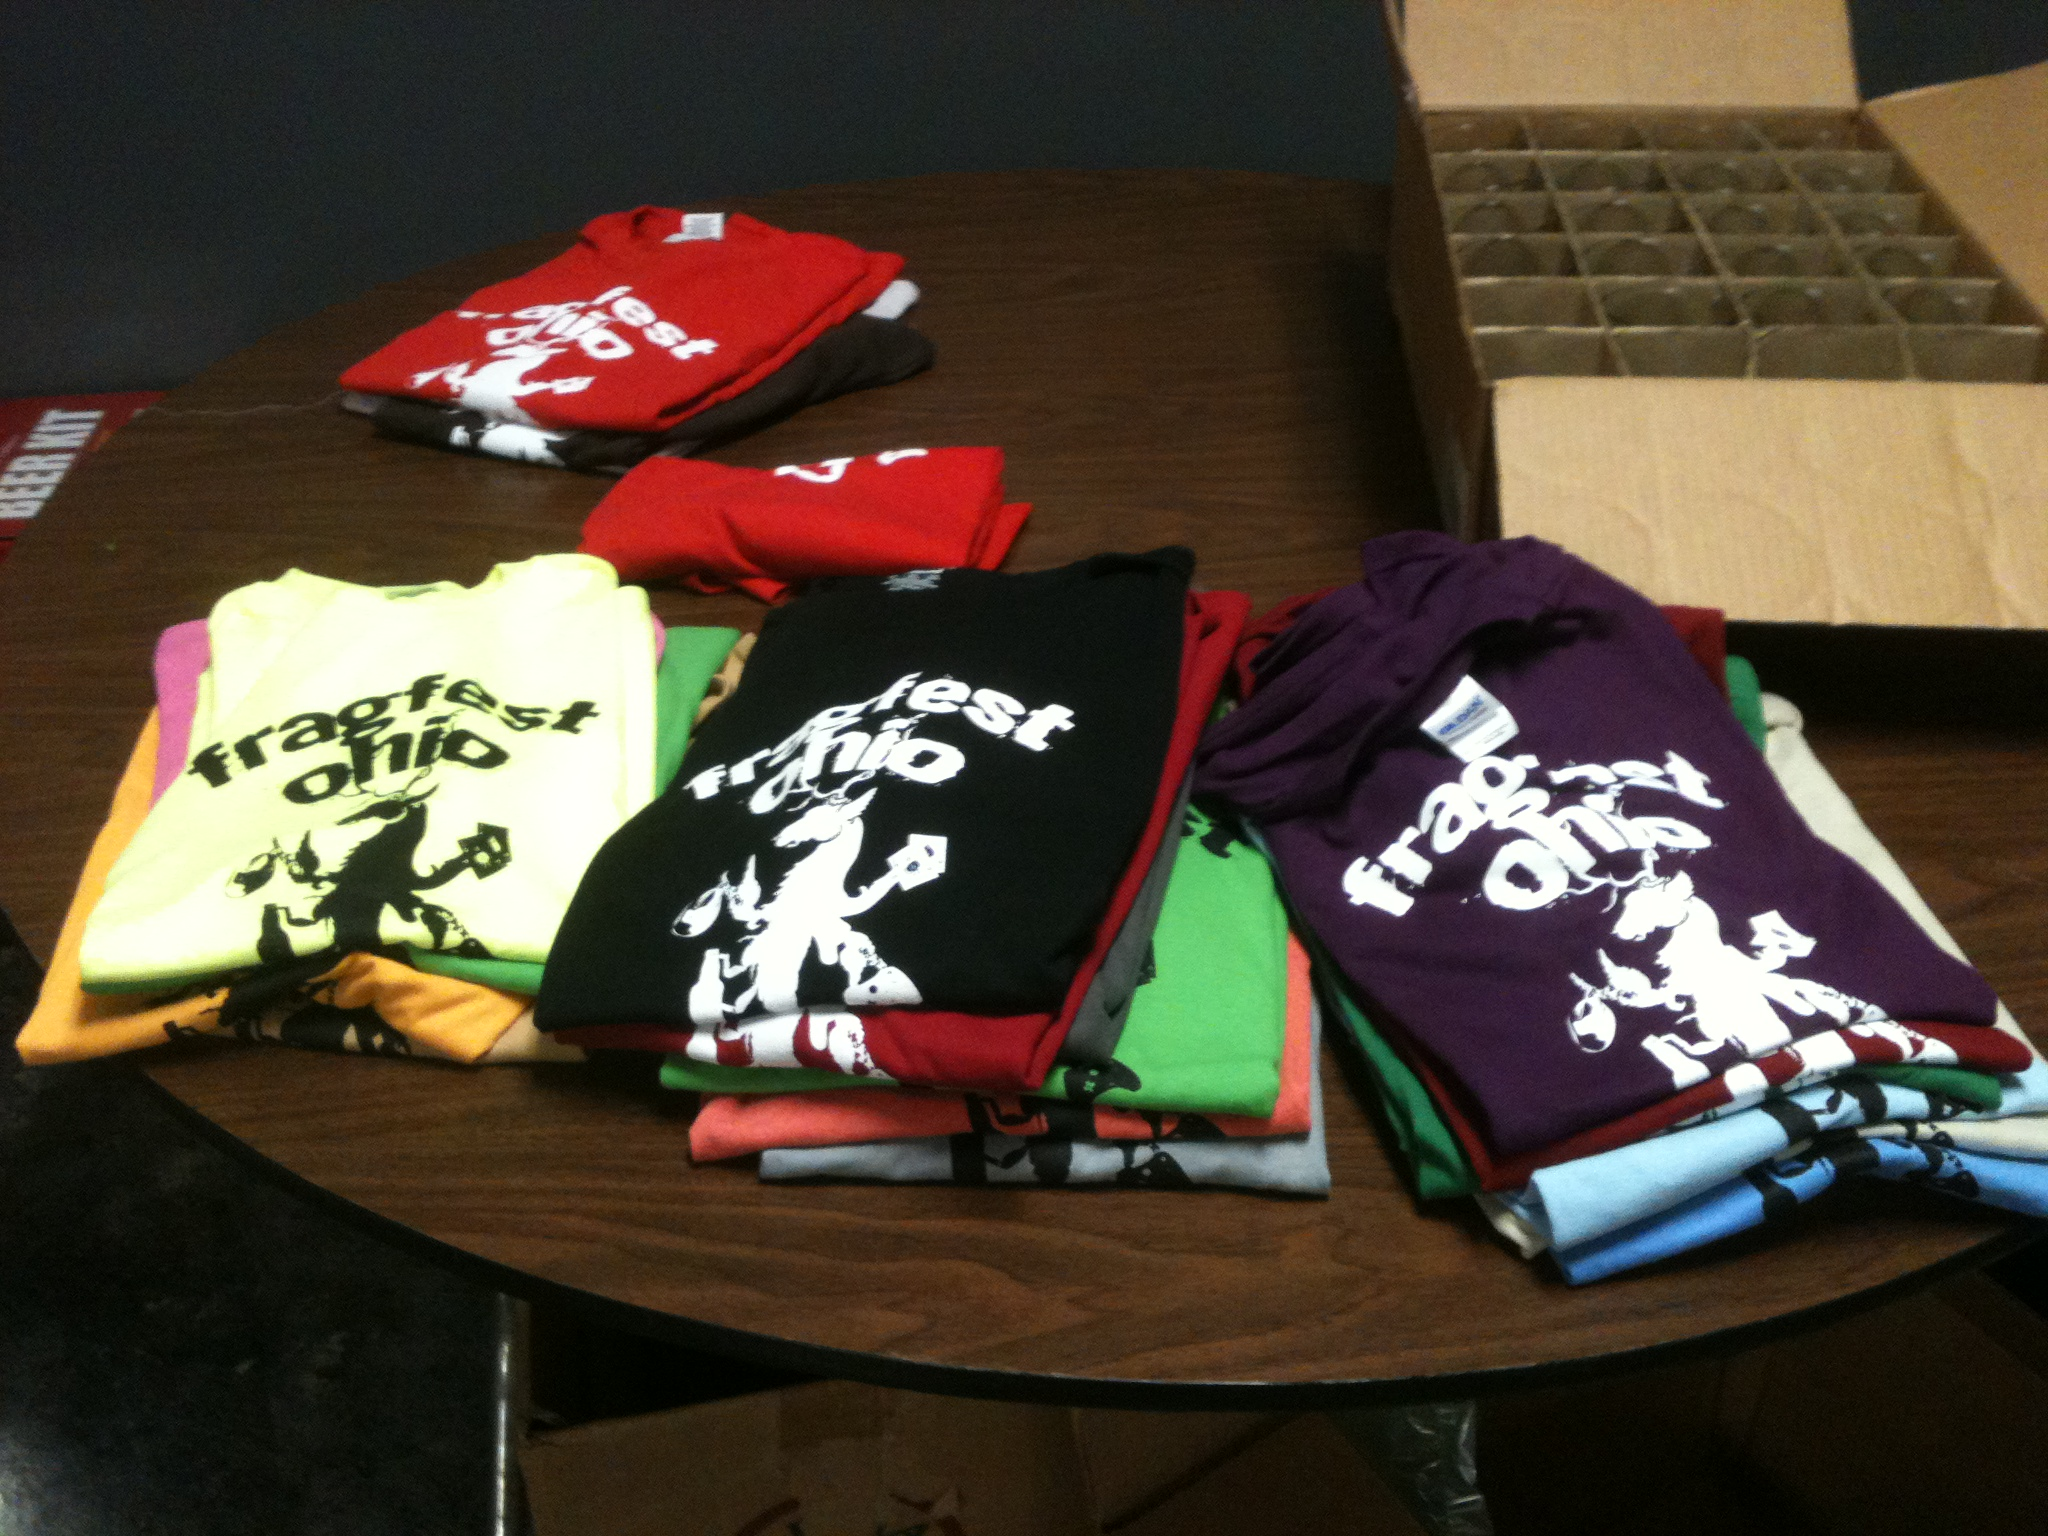 ff2013shirts.jpg